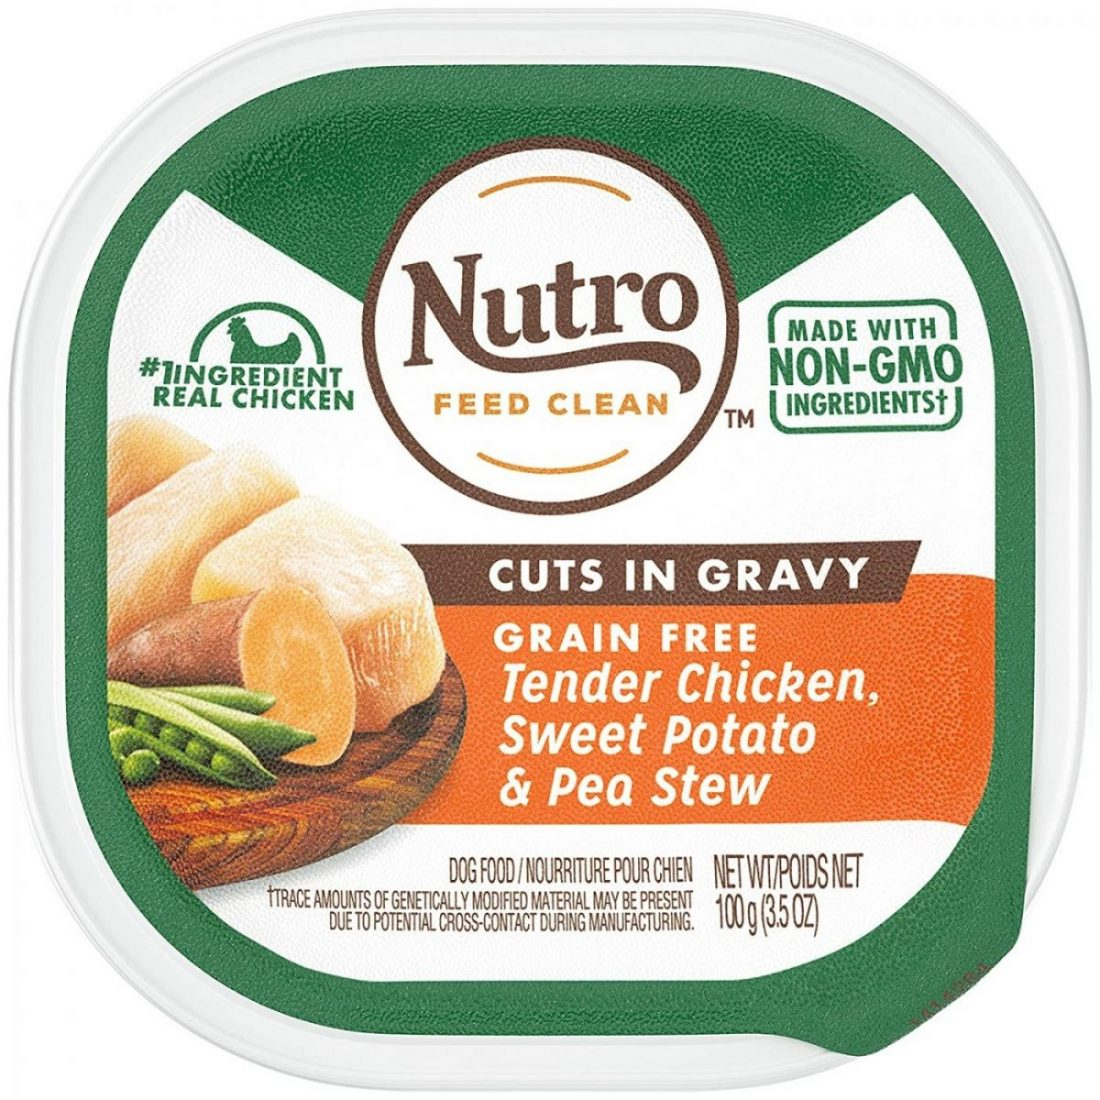 Nutro Grain-free Dry Dog Food